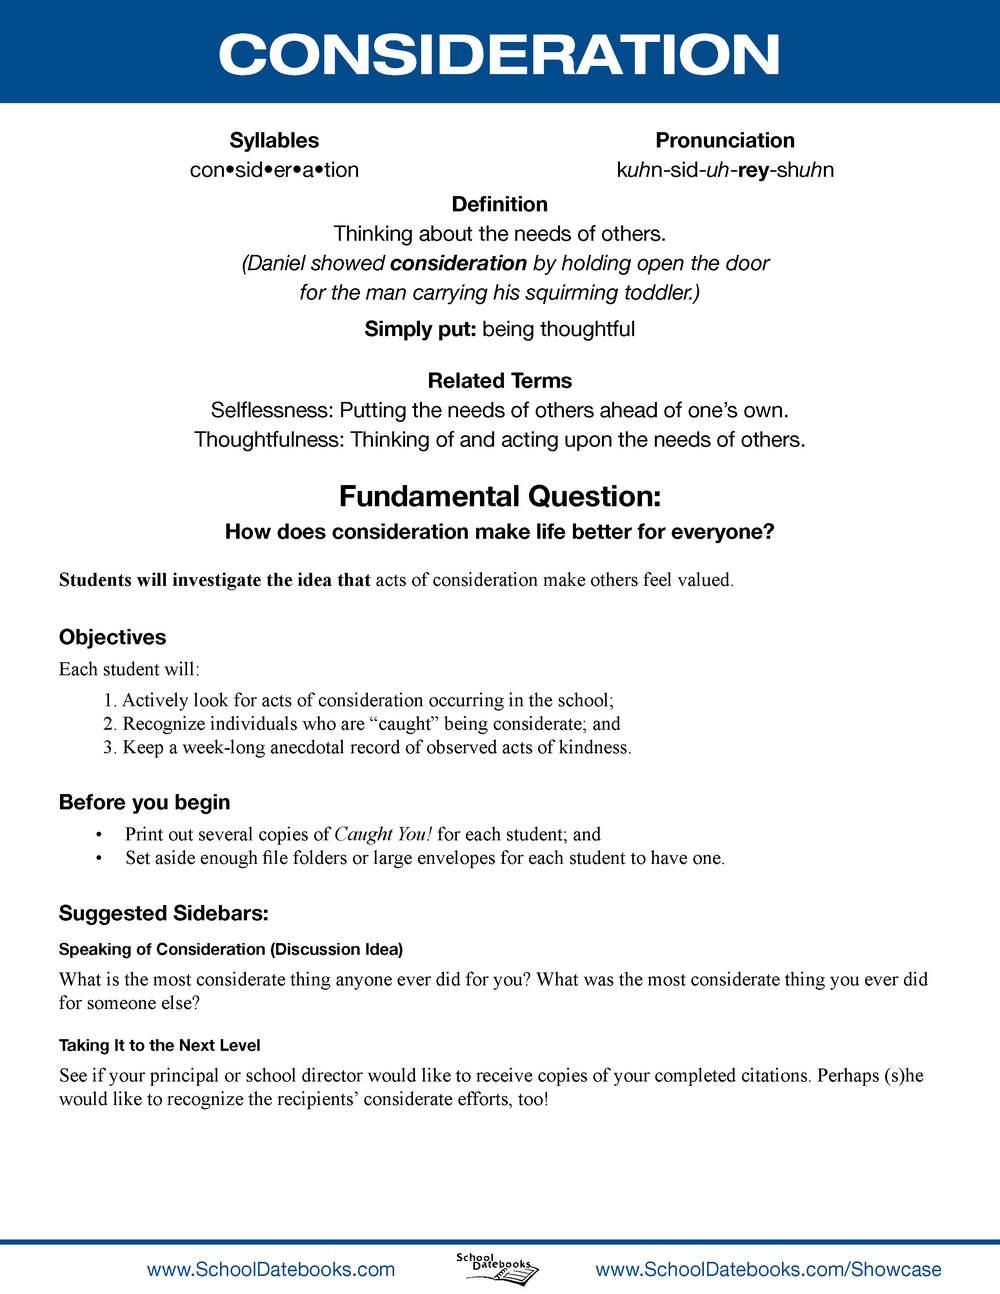 LessonPlan-Consideration_Page_1.jpg